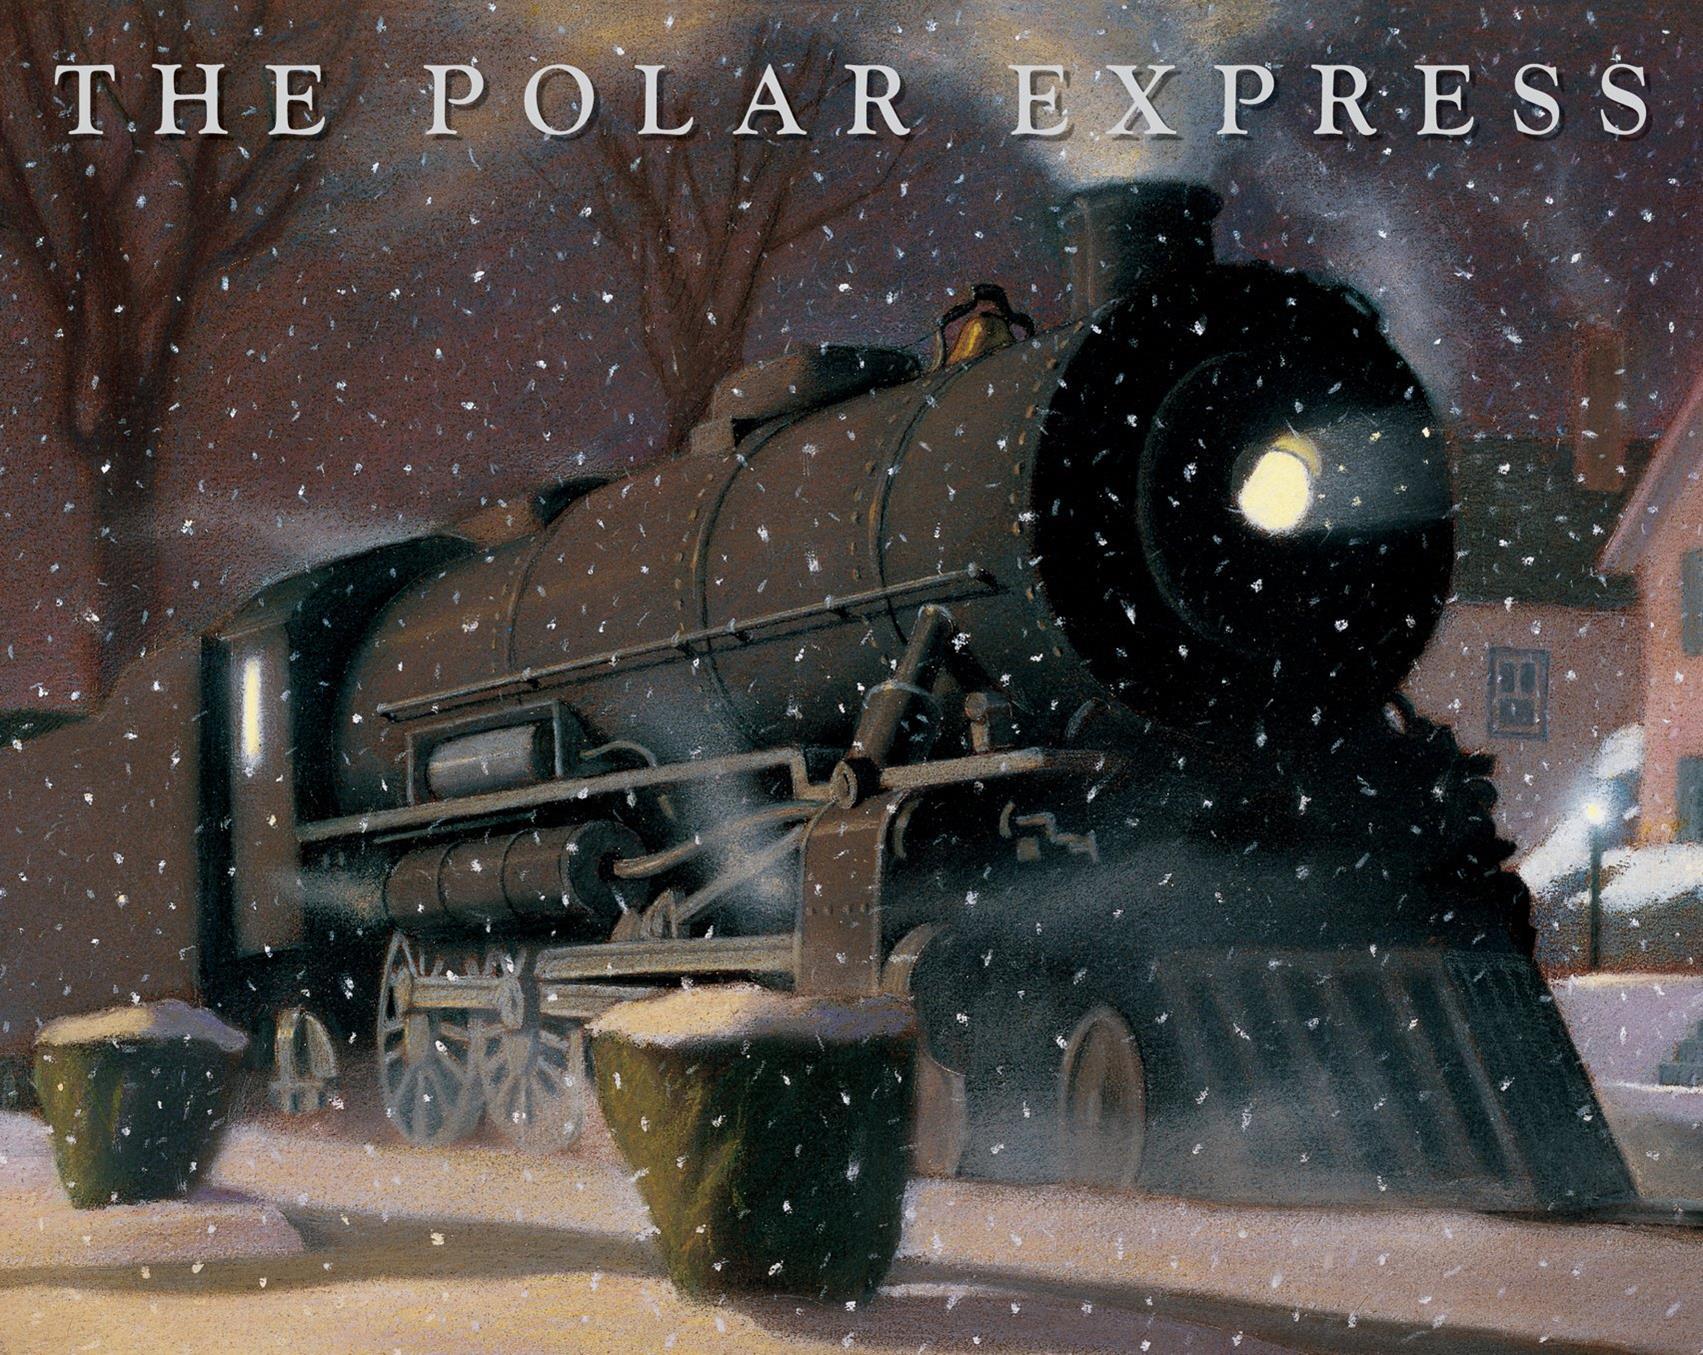 Polar Express photo.jpg